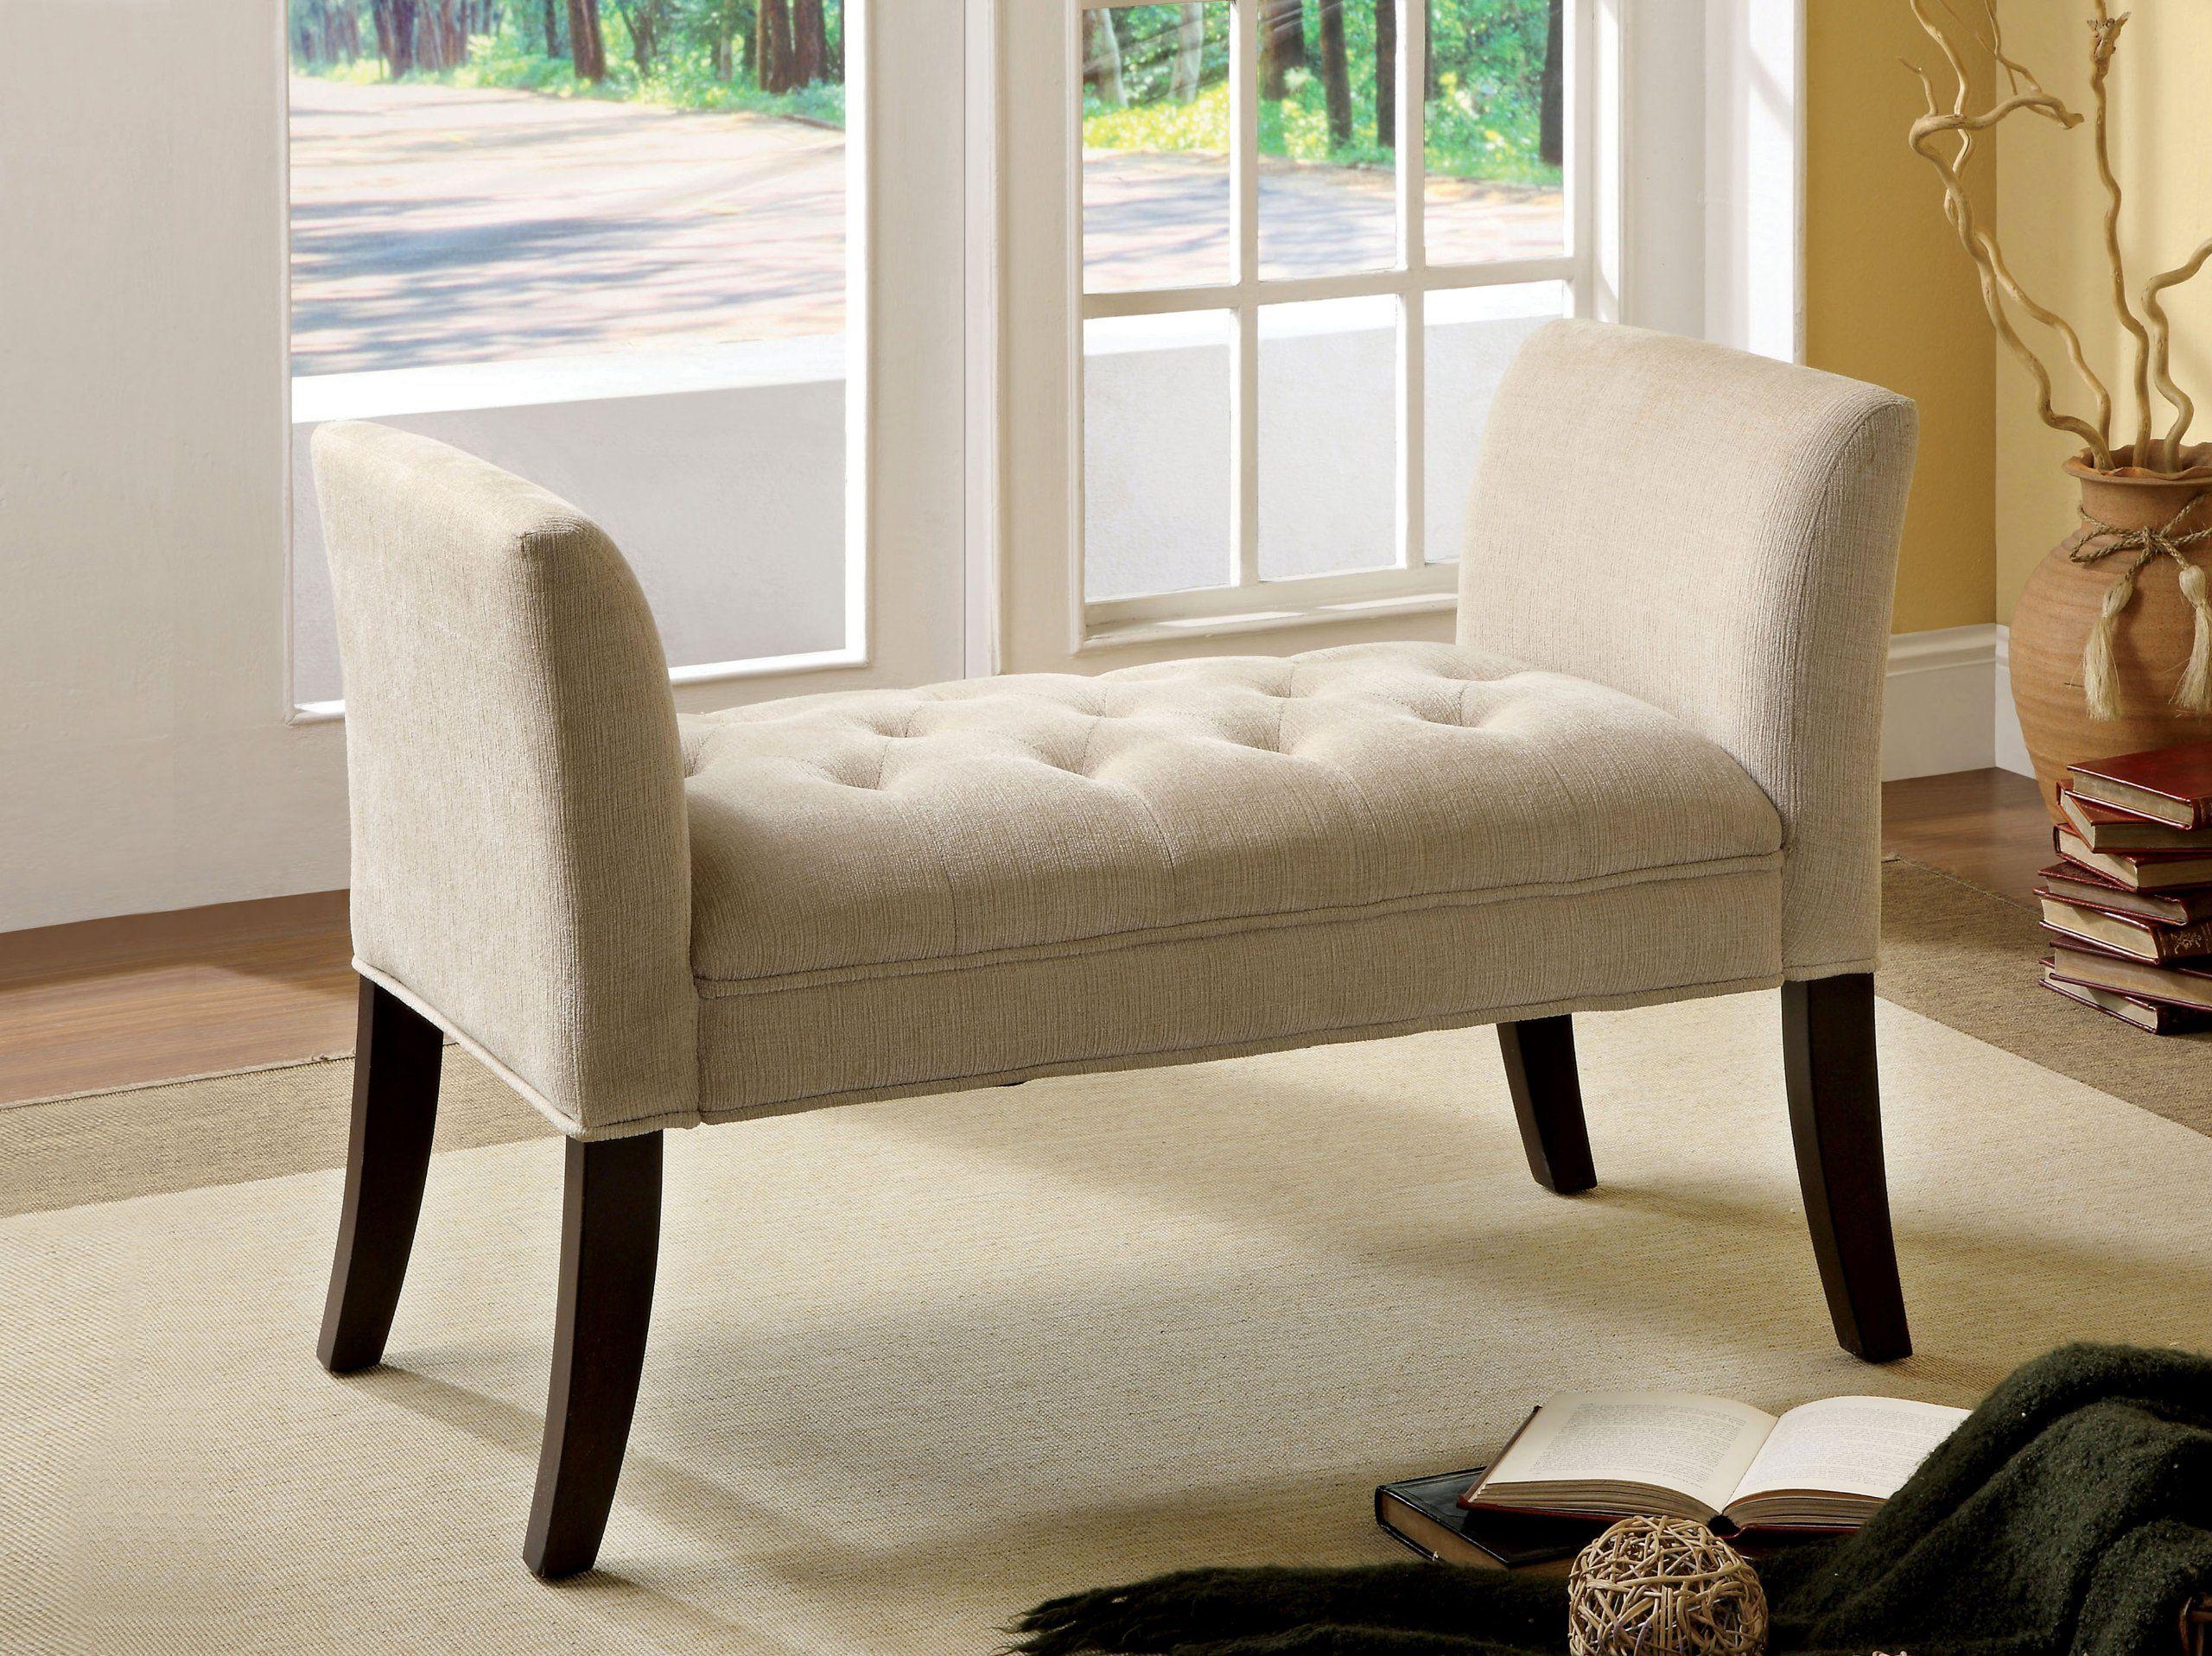 Amazon com   Furniture of America Venetian Fabric Vanity Bench  Ivory   Bedroom  Bench. Amazon com   Furniture of America Venetian Fabric Vanity Bench